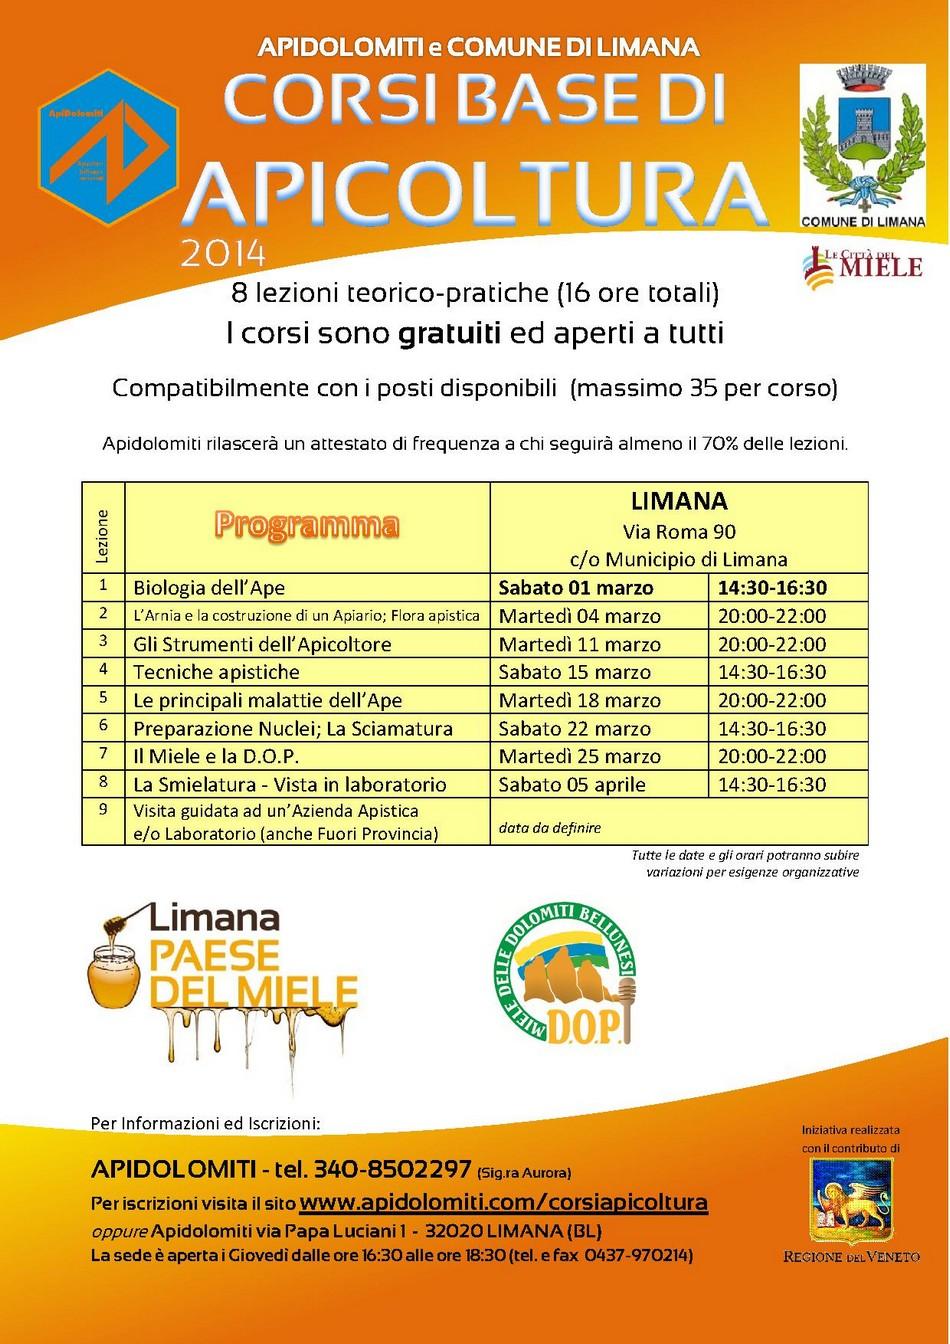 Corso APICOLTURA 2014 - LIMANA